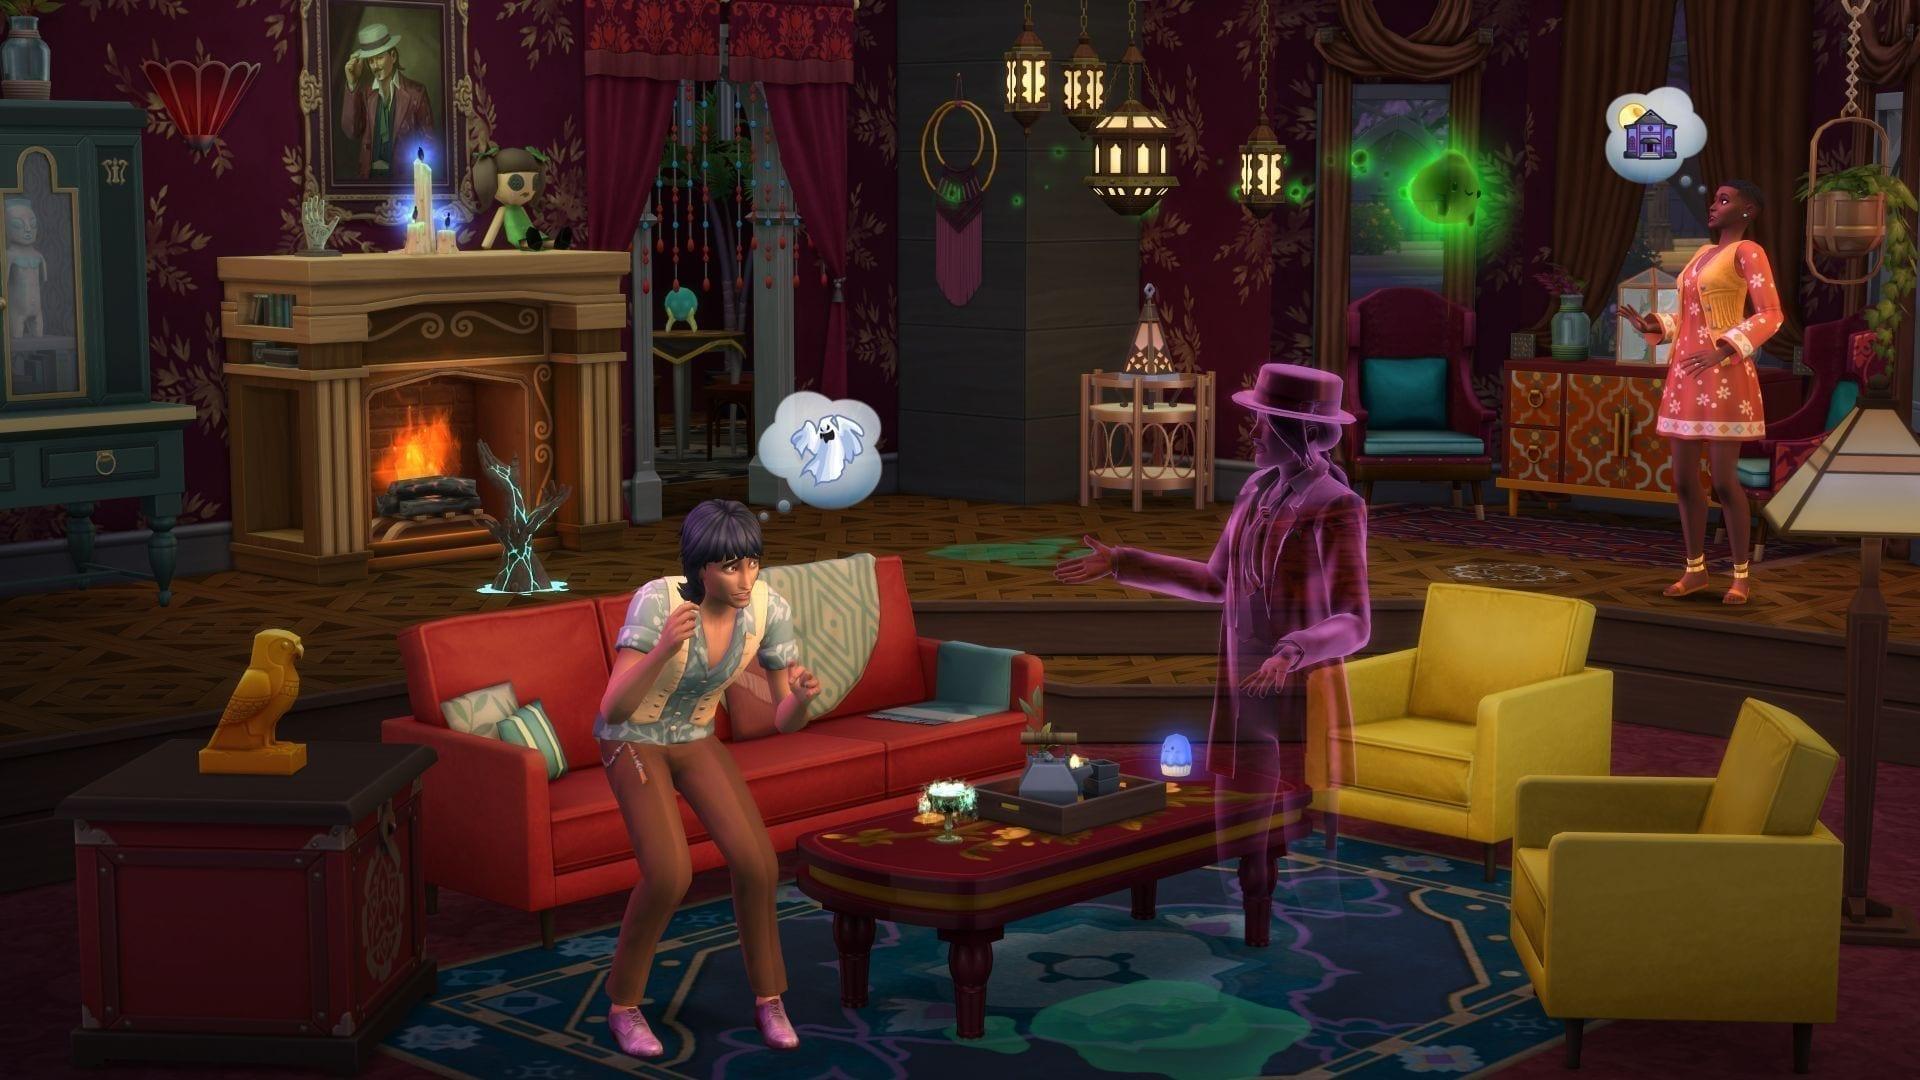 Die Sims 4 Paranormale Phänomene-Accessoires-Pack Geist